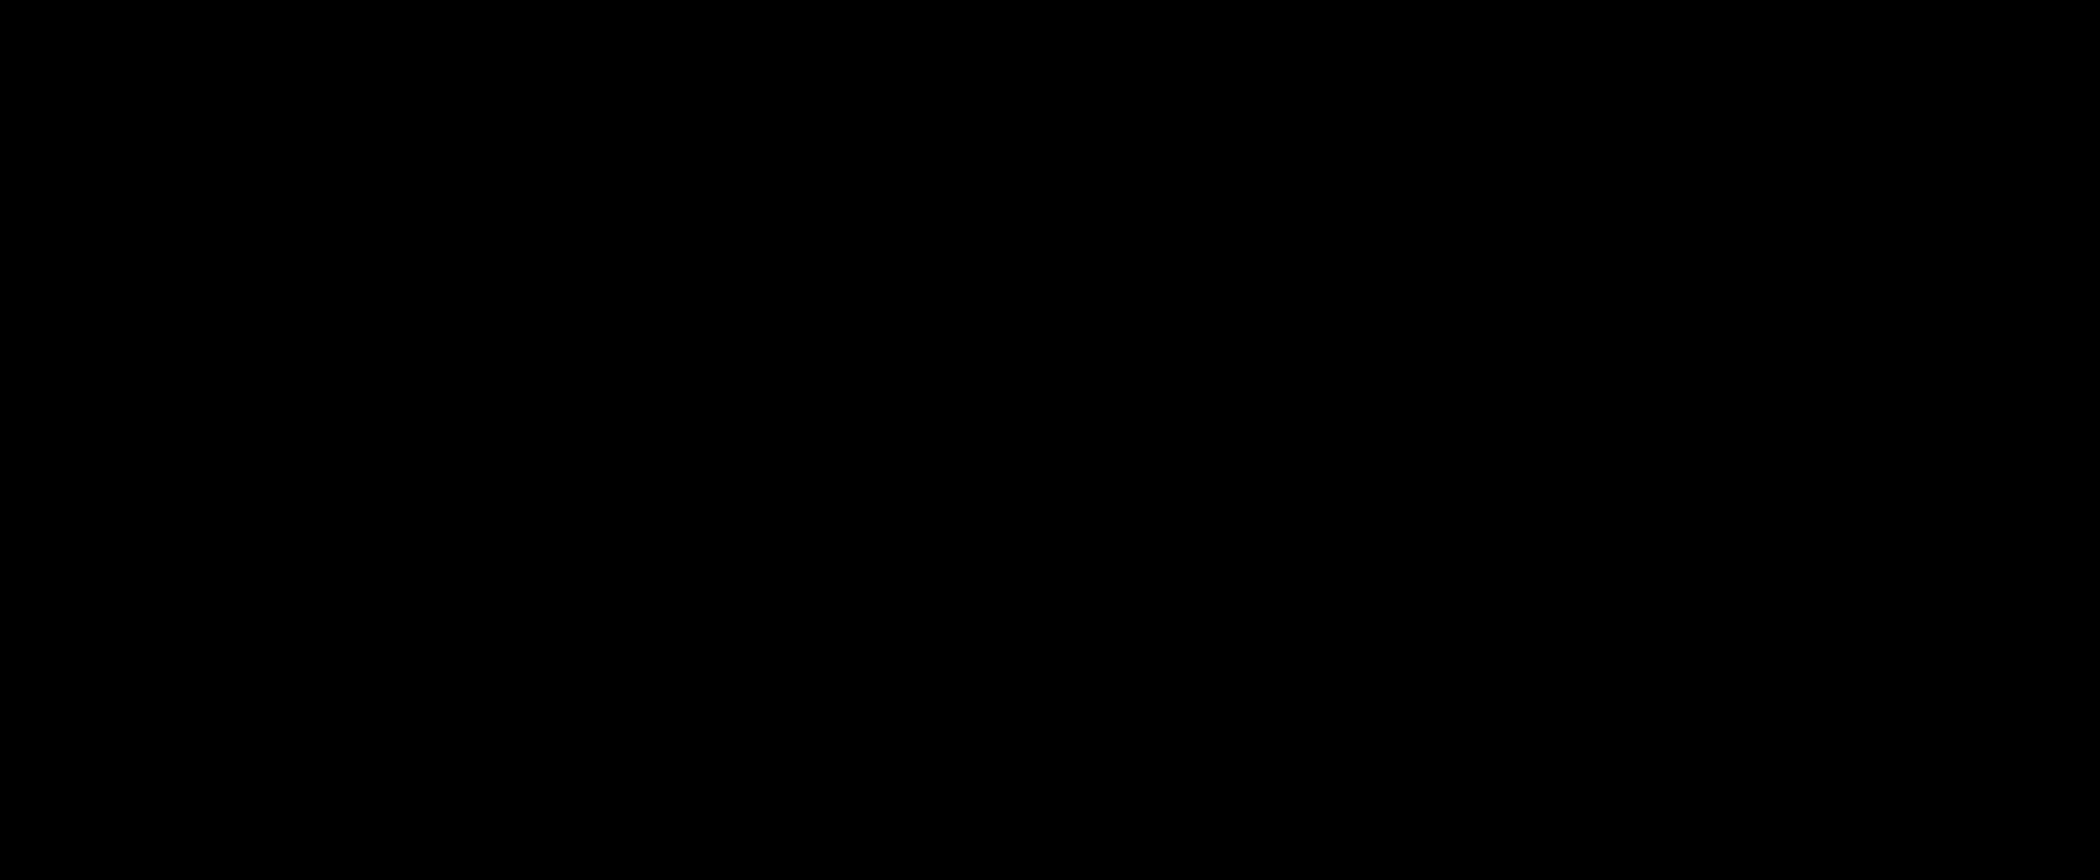 disney logo 1 - Disney Logo